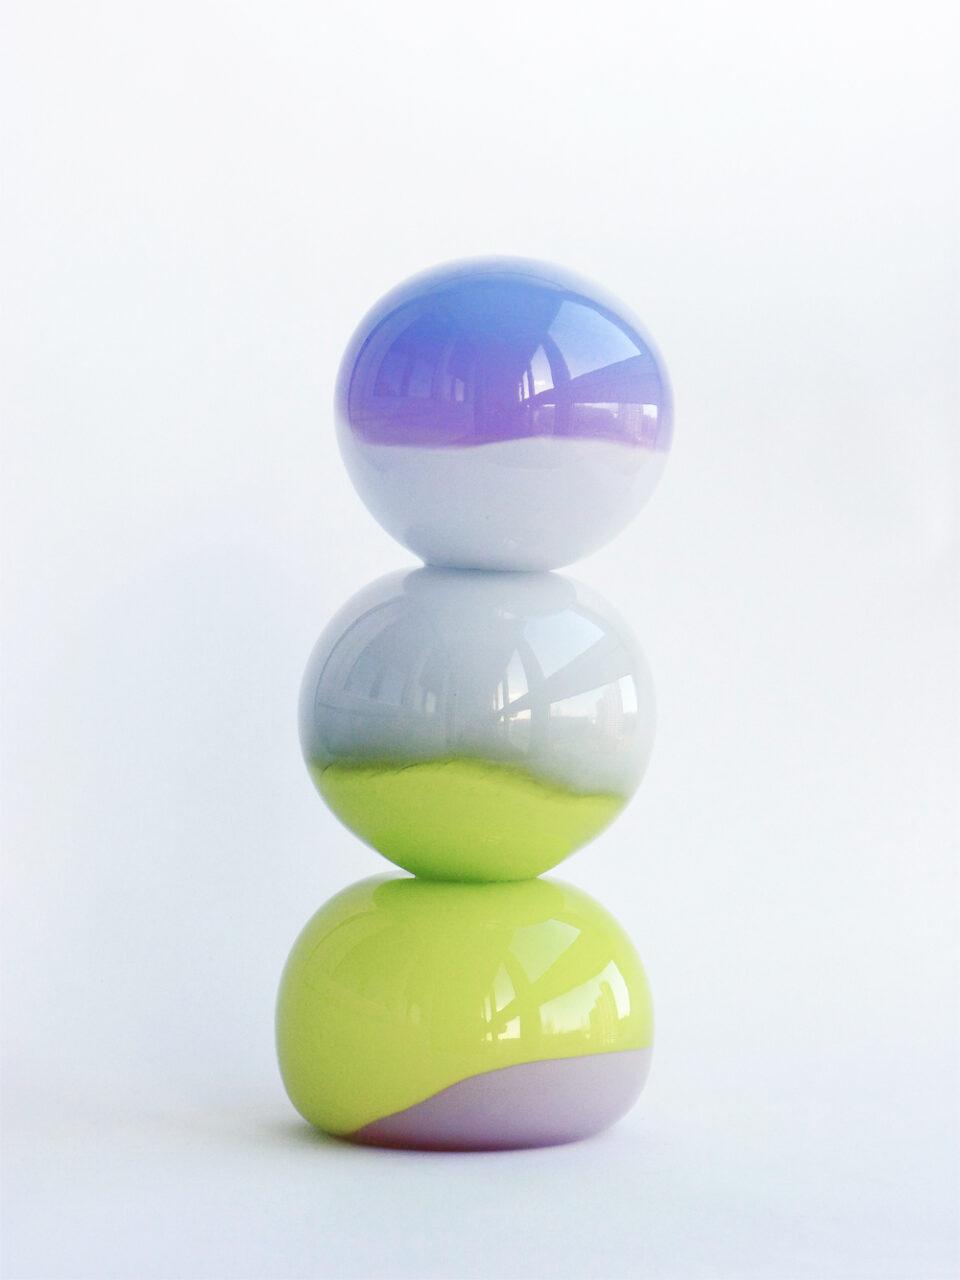 Untitled VI, 2020, blown glass